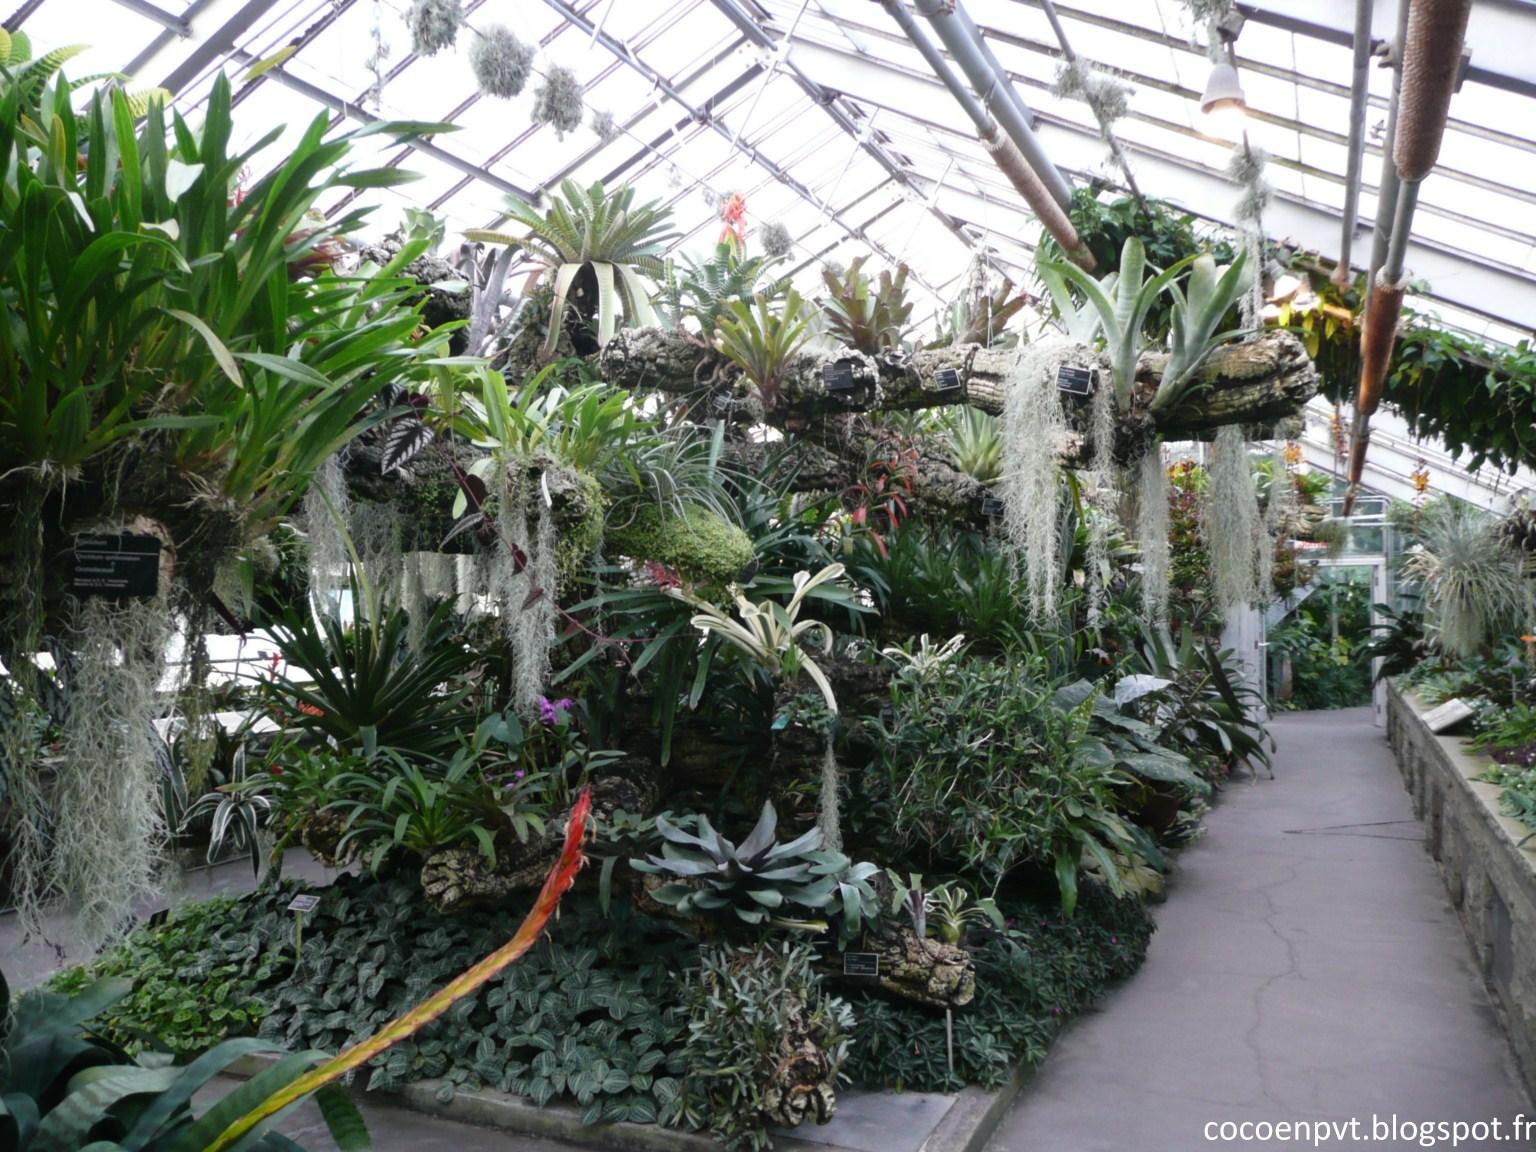 Coco en pvt les serres du jardin botanique for Bd du jardin botanique 50